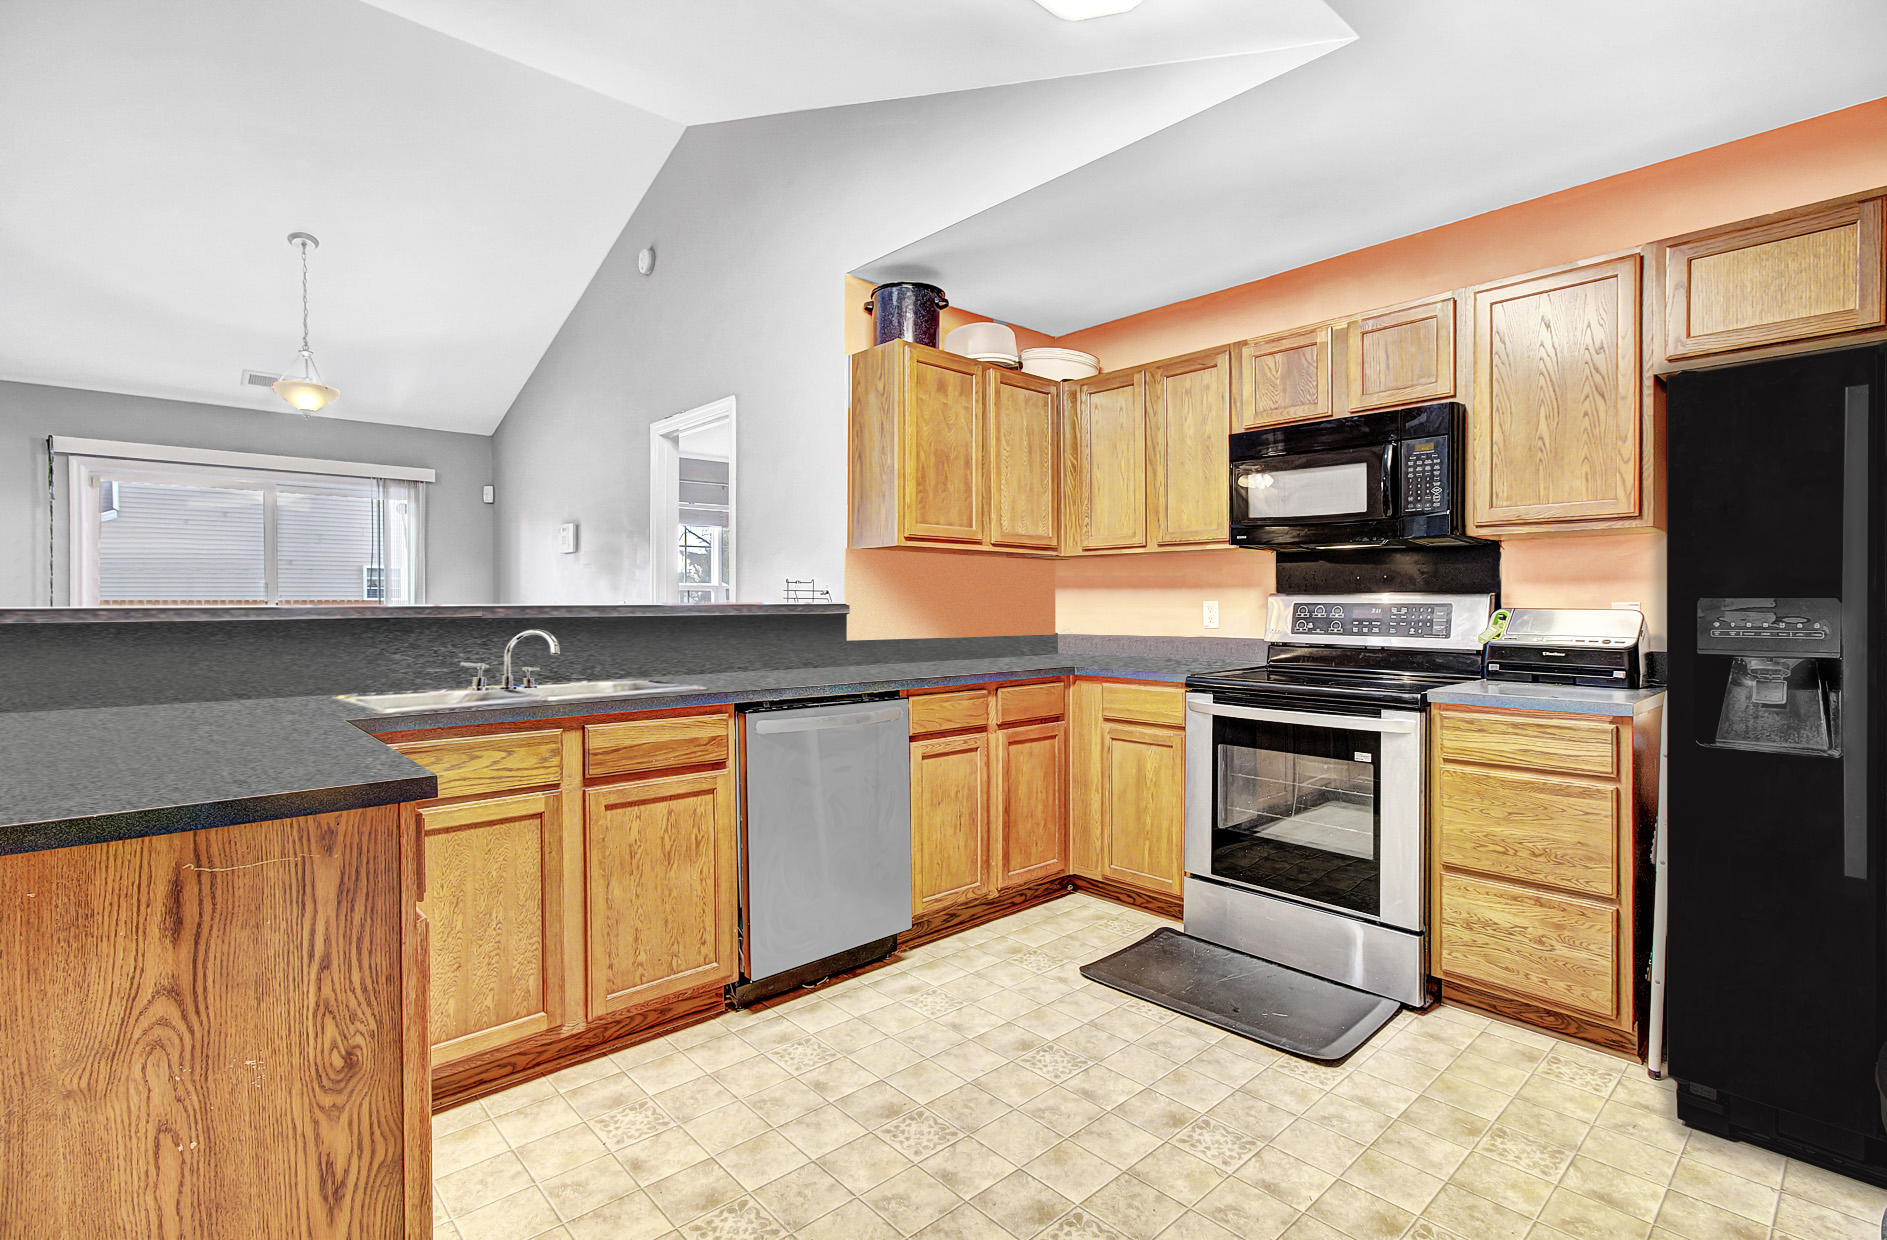 Oakley Pointe Homes For Sale - 231 Silk Oak, Moncks Corner, SC - 6